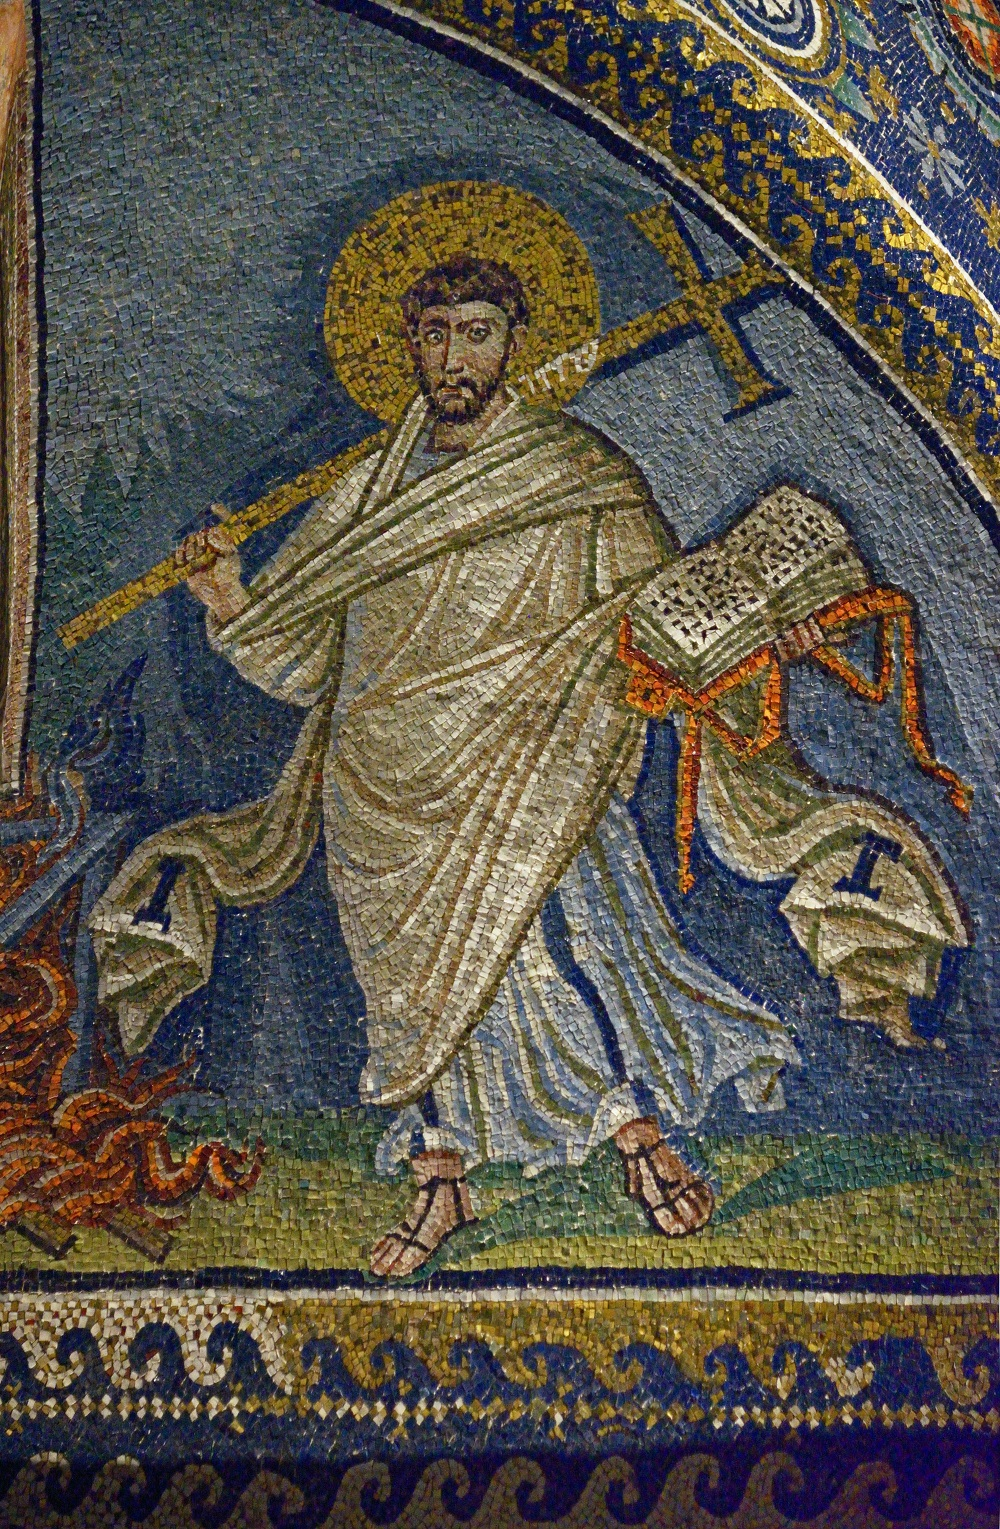 Mosaic of St. Lawrence | Mausoleum of Galla Placidia, Ravenna |  Image Source